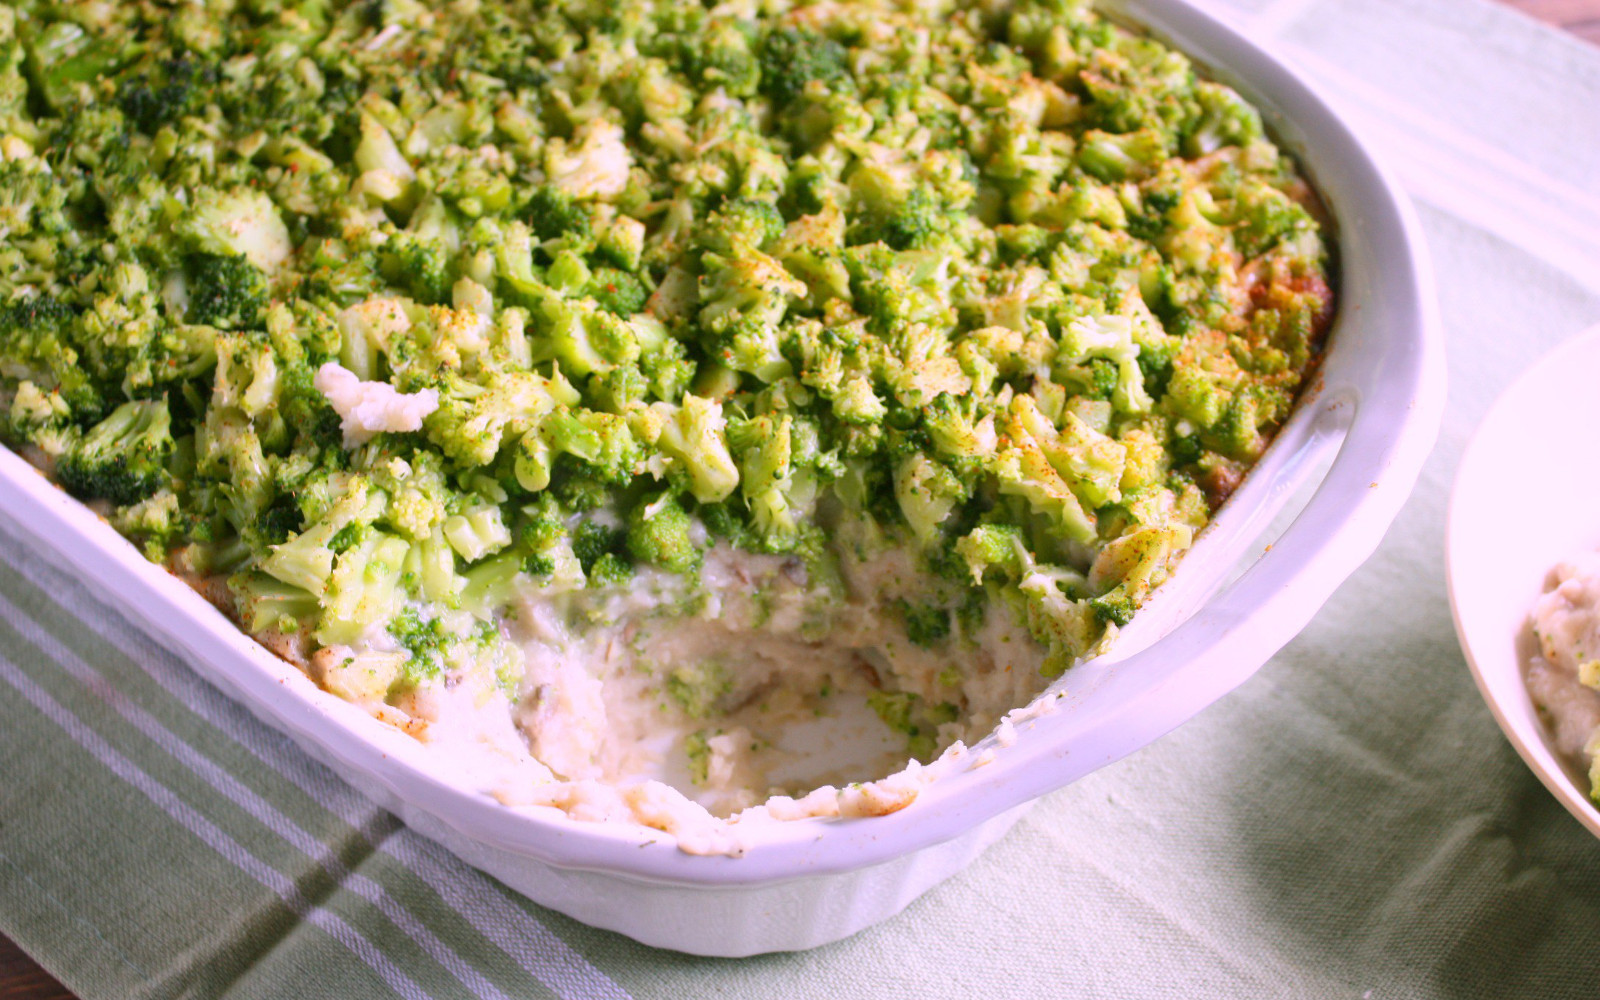 Mashed Potato Casserole With Broccoli and a Cauliflower Gravy